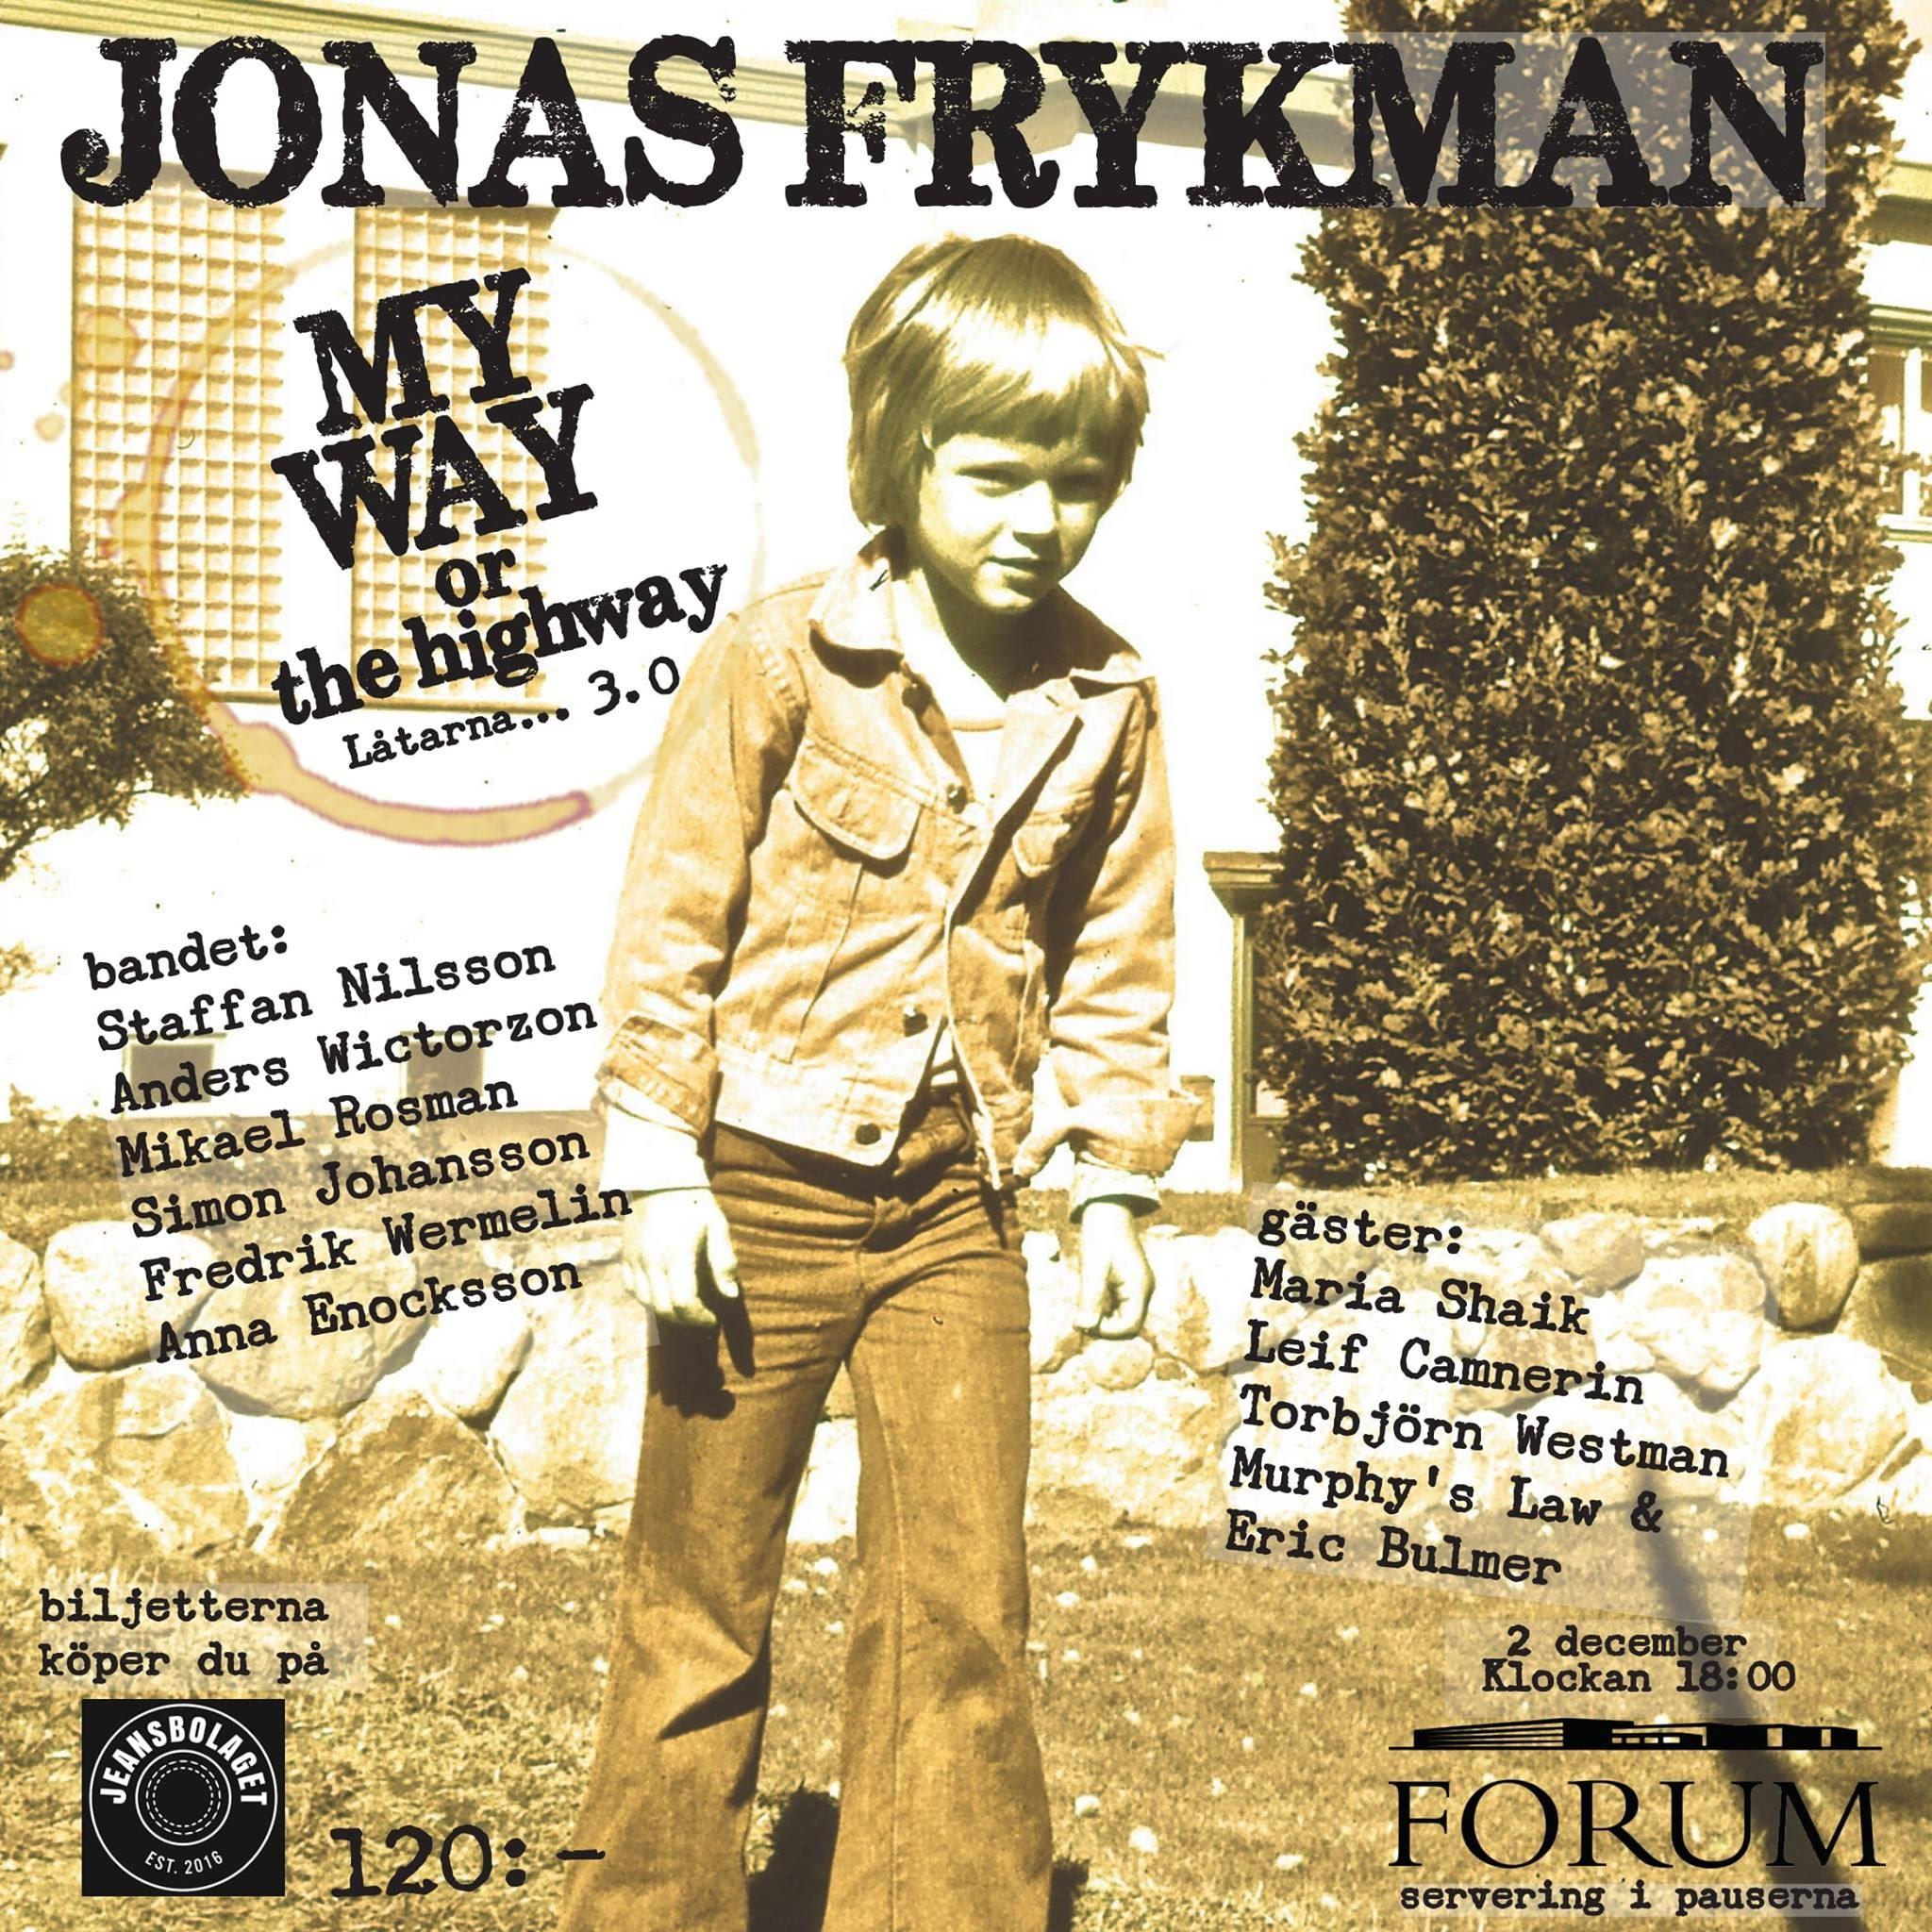 Jonas Frykman, My way or the highway